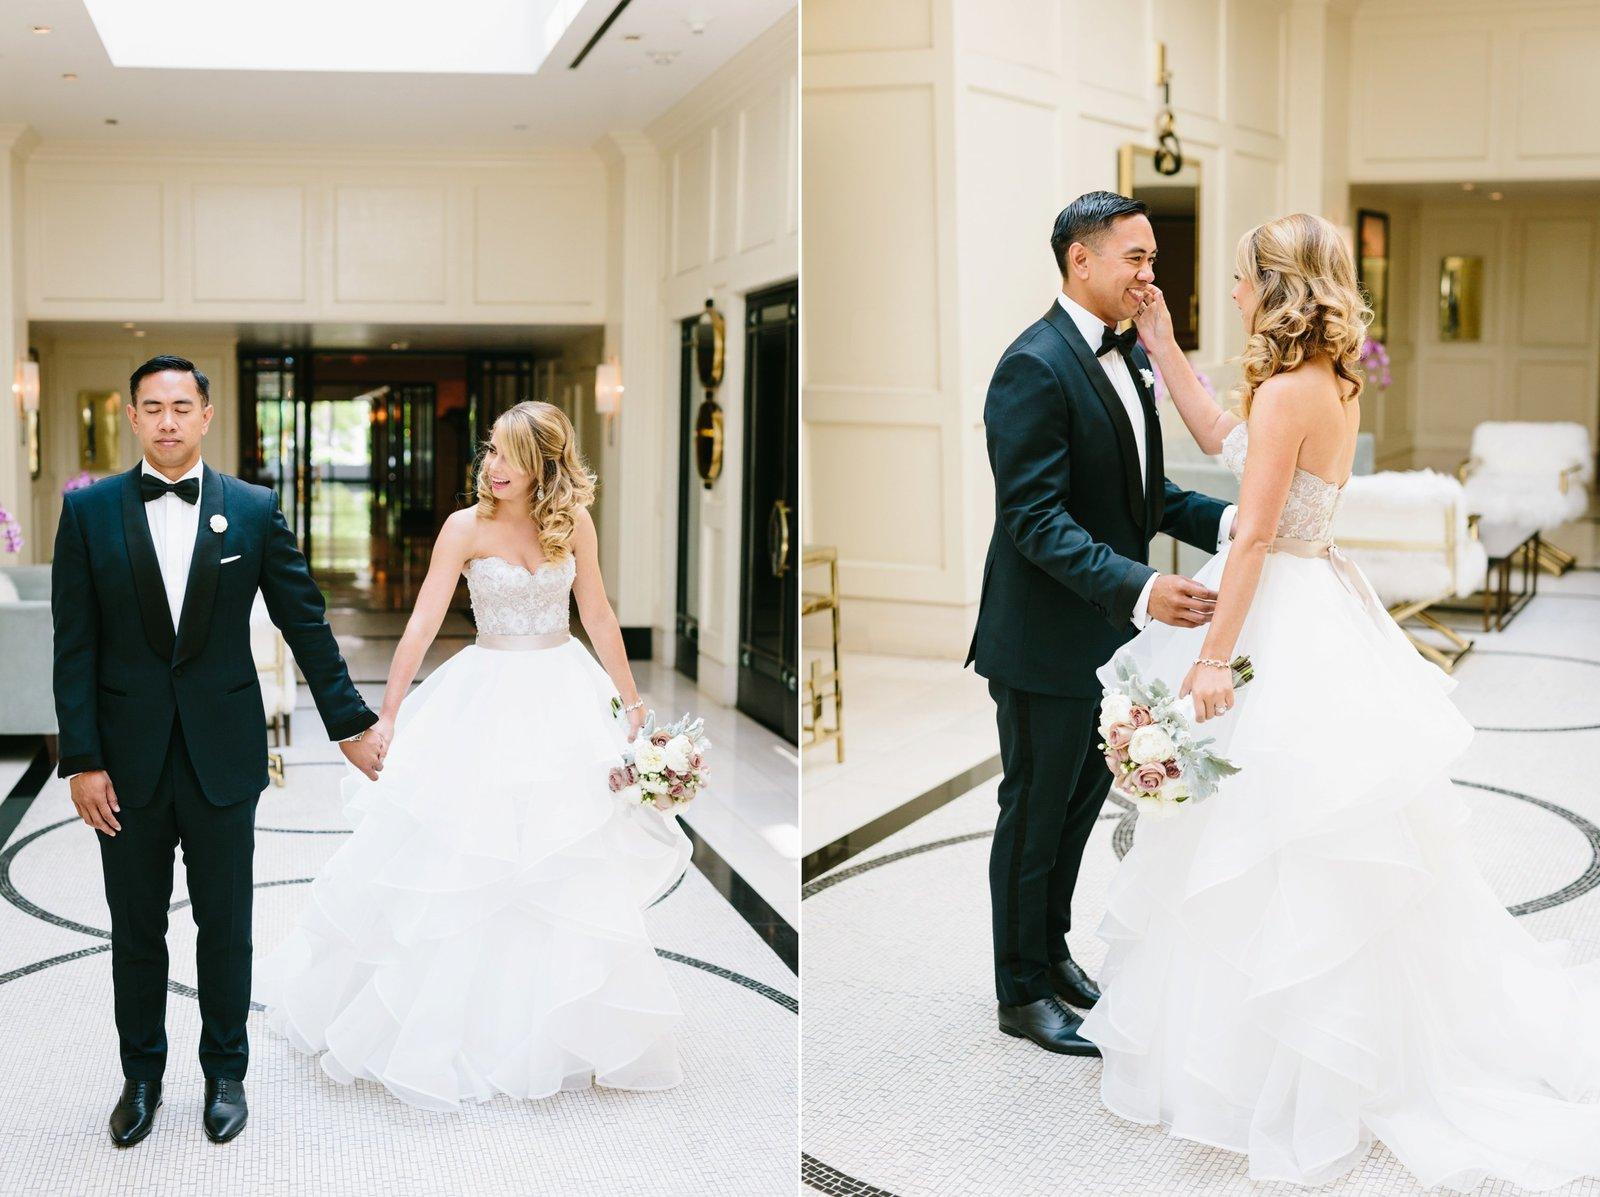 Wedding Photos-Jodee Debes Photography-182